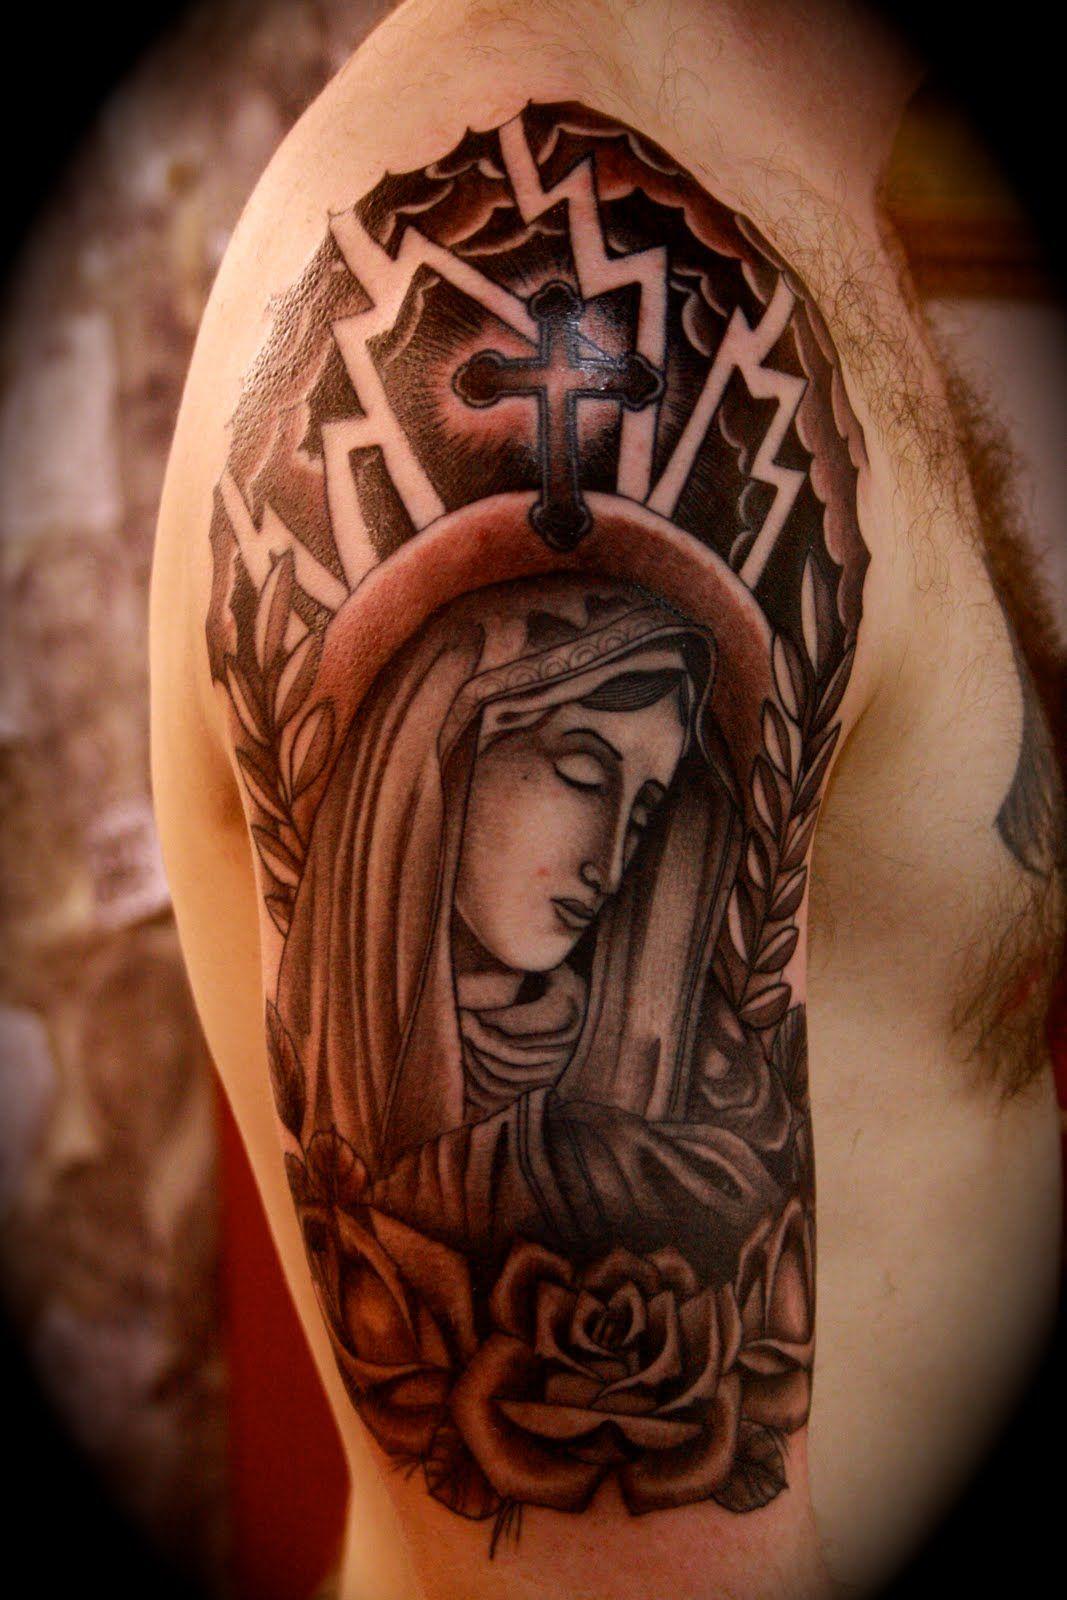 Best Christian Tattoos Religious Tattoos Designs, Ideas